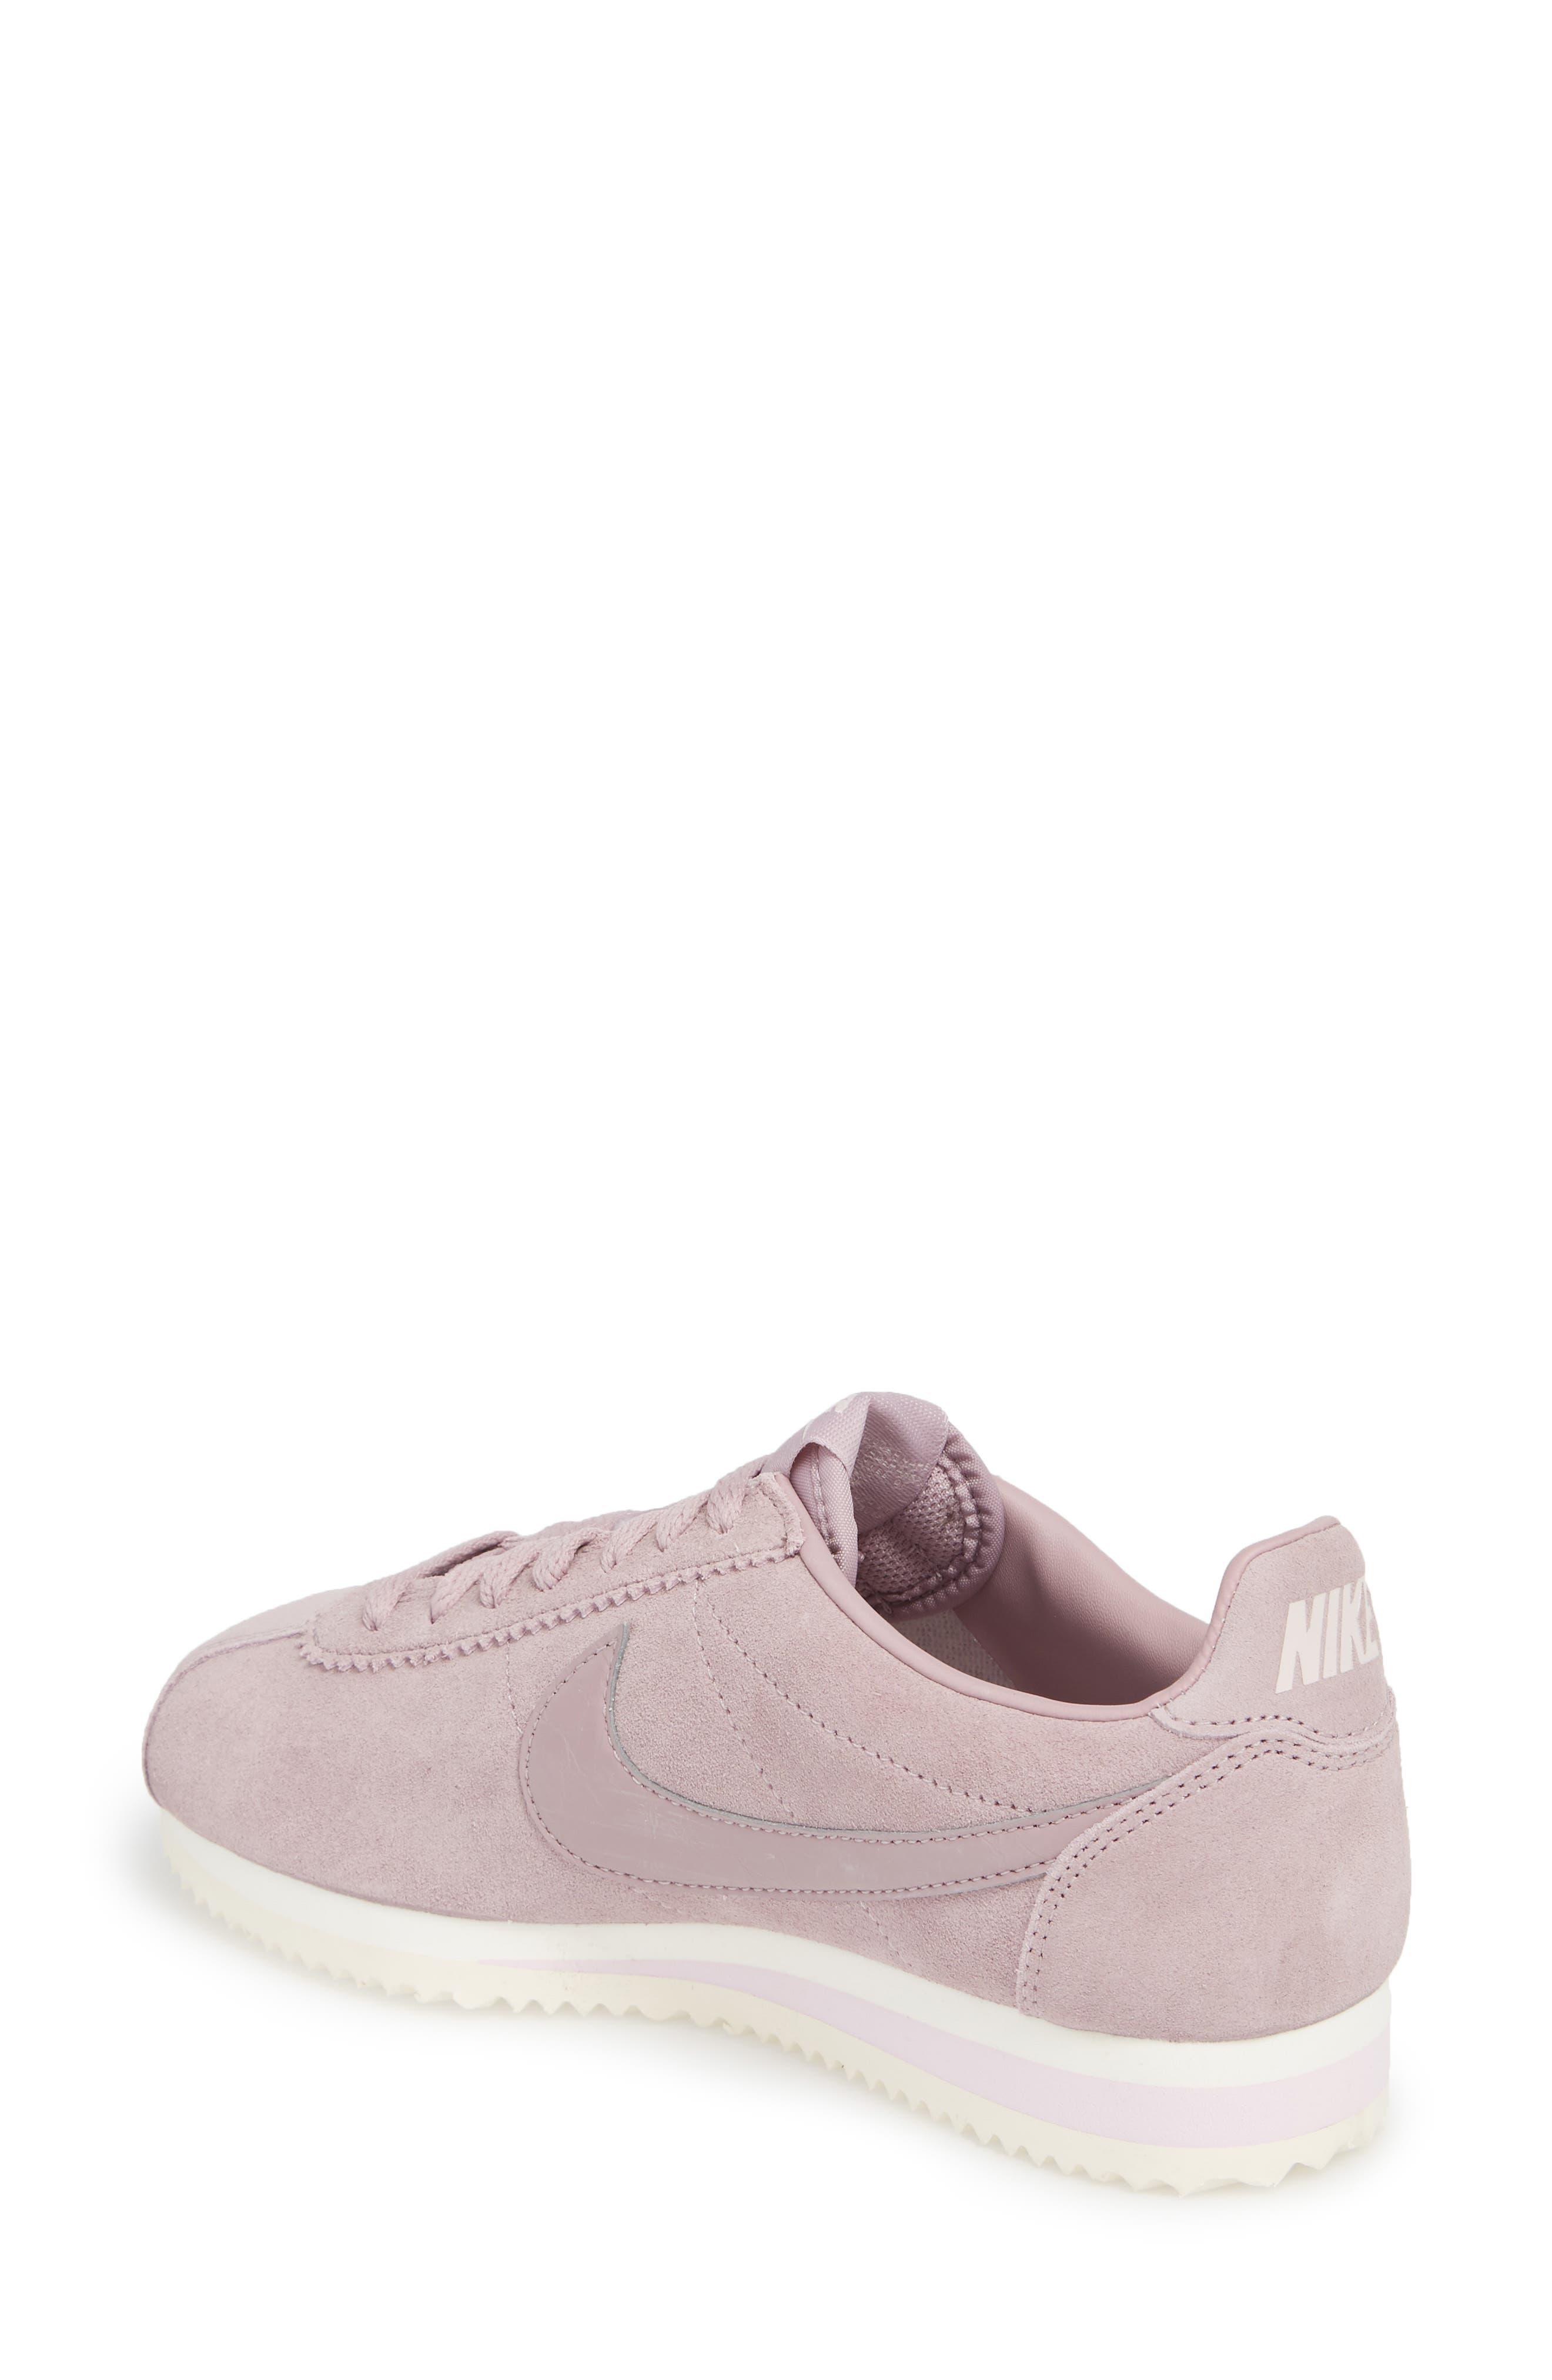 NIKE,                             Classic Cortez Suede Sneaker,                             Alternate thumbnail 2, color,                             650